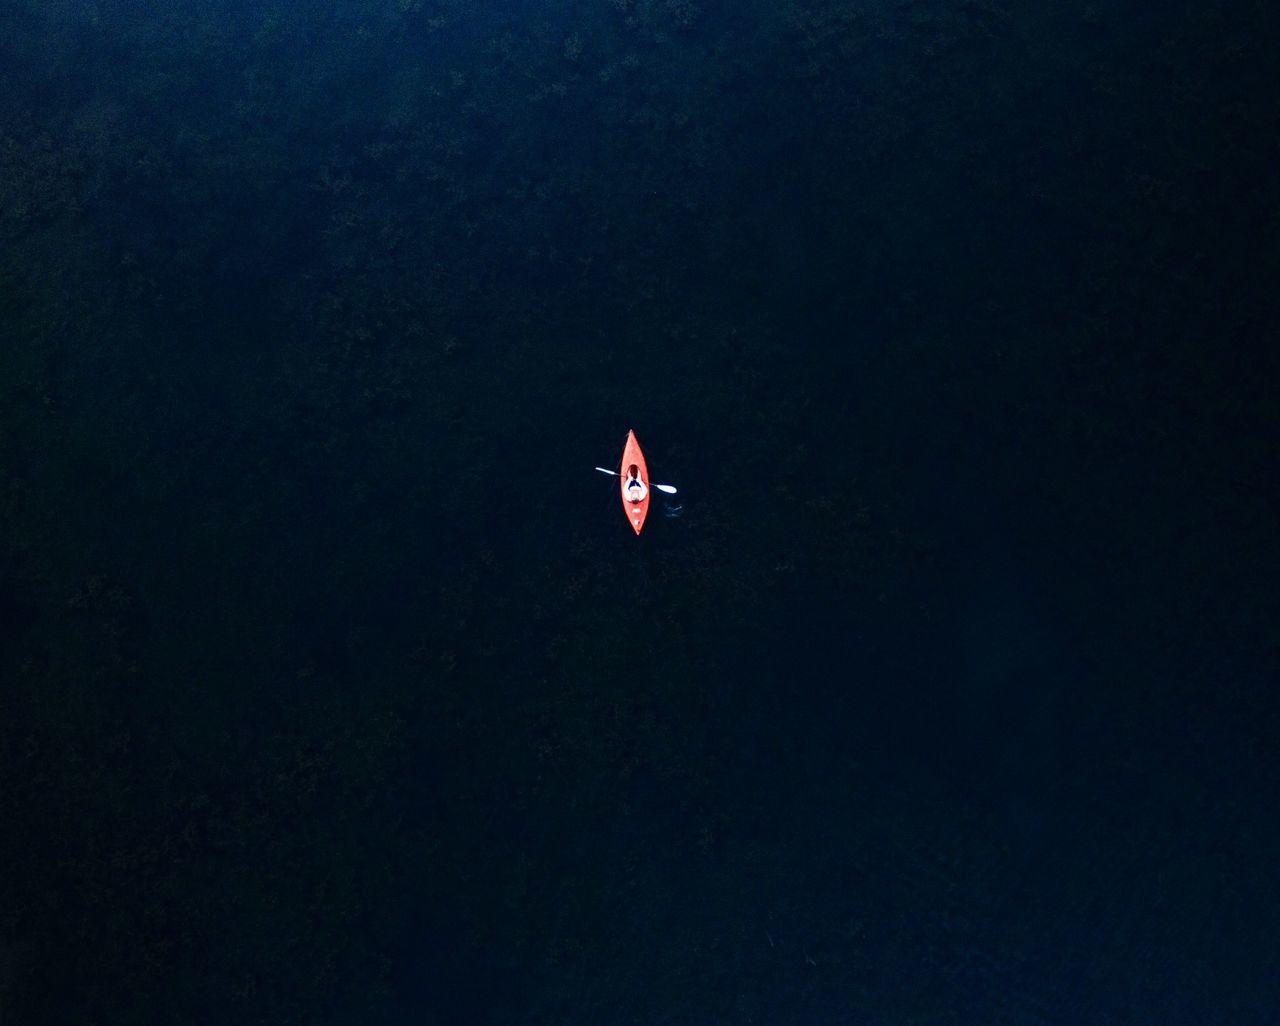 Beautiful stock photos of drones, , Horizontal Image, adventure, canoe